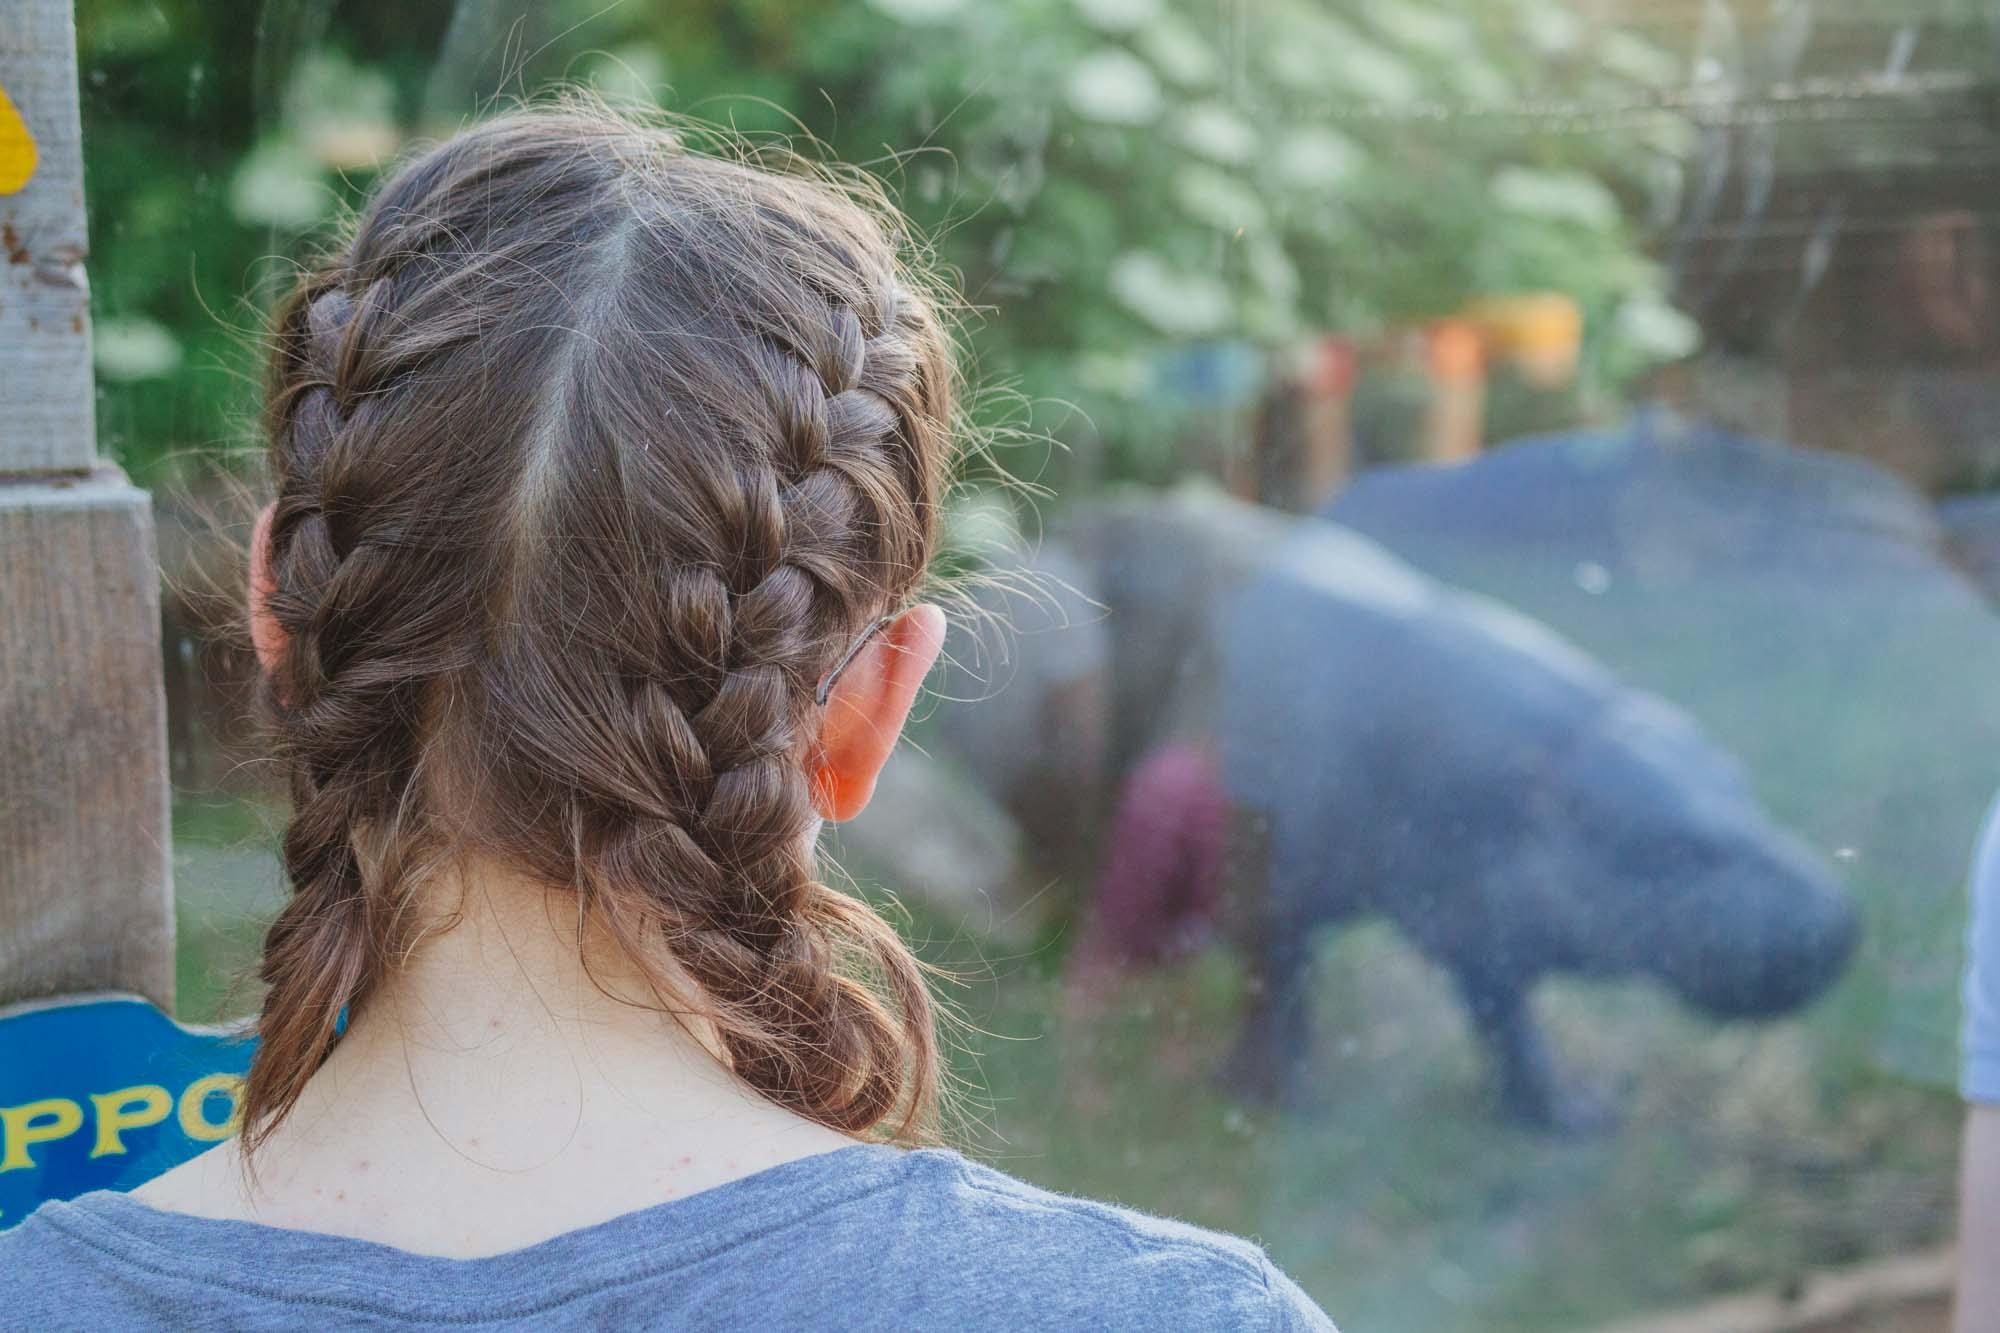 London Zoo - Pygmy hippos